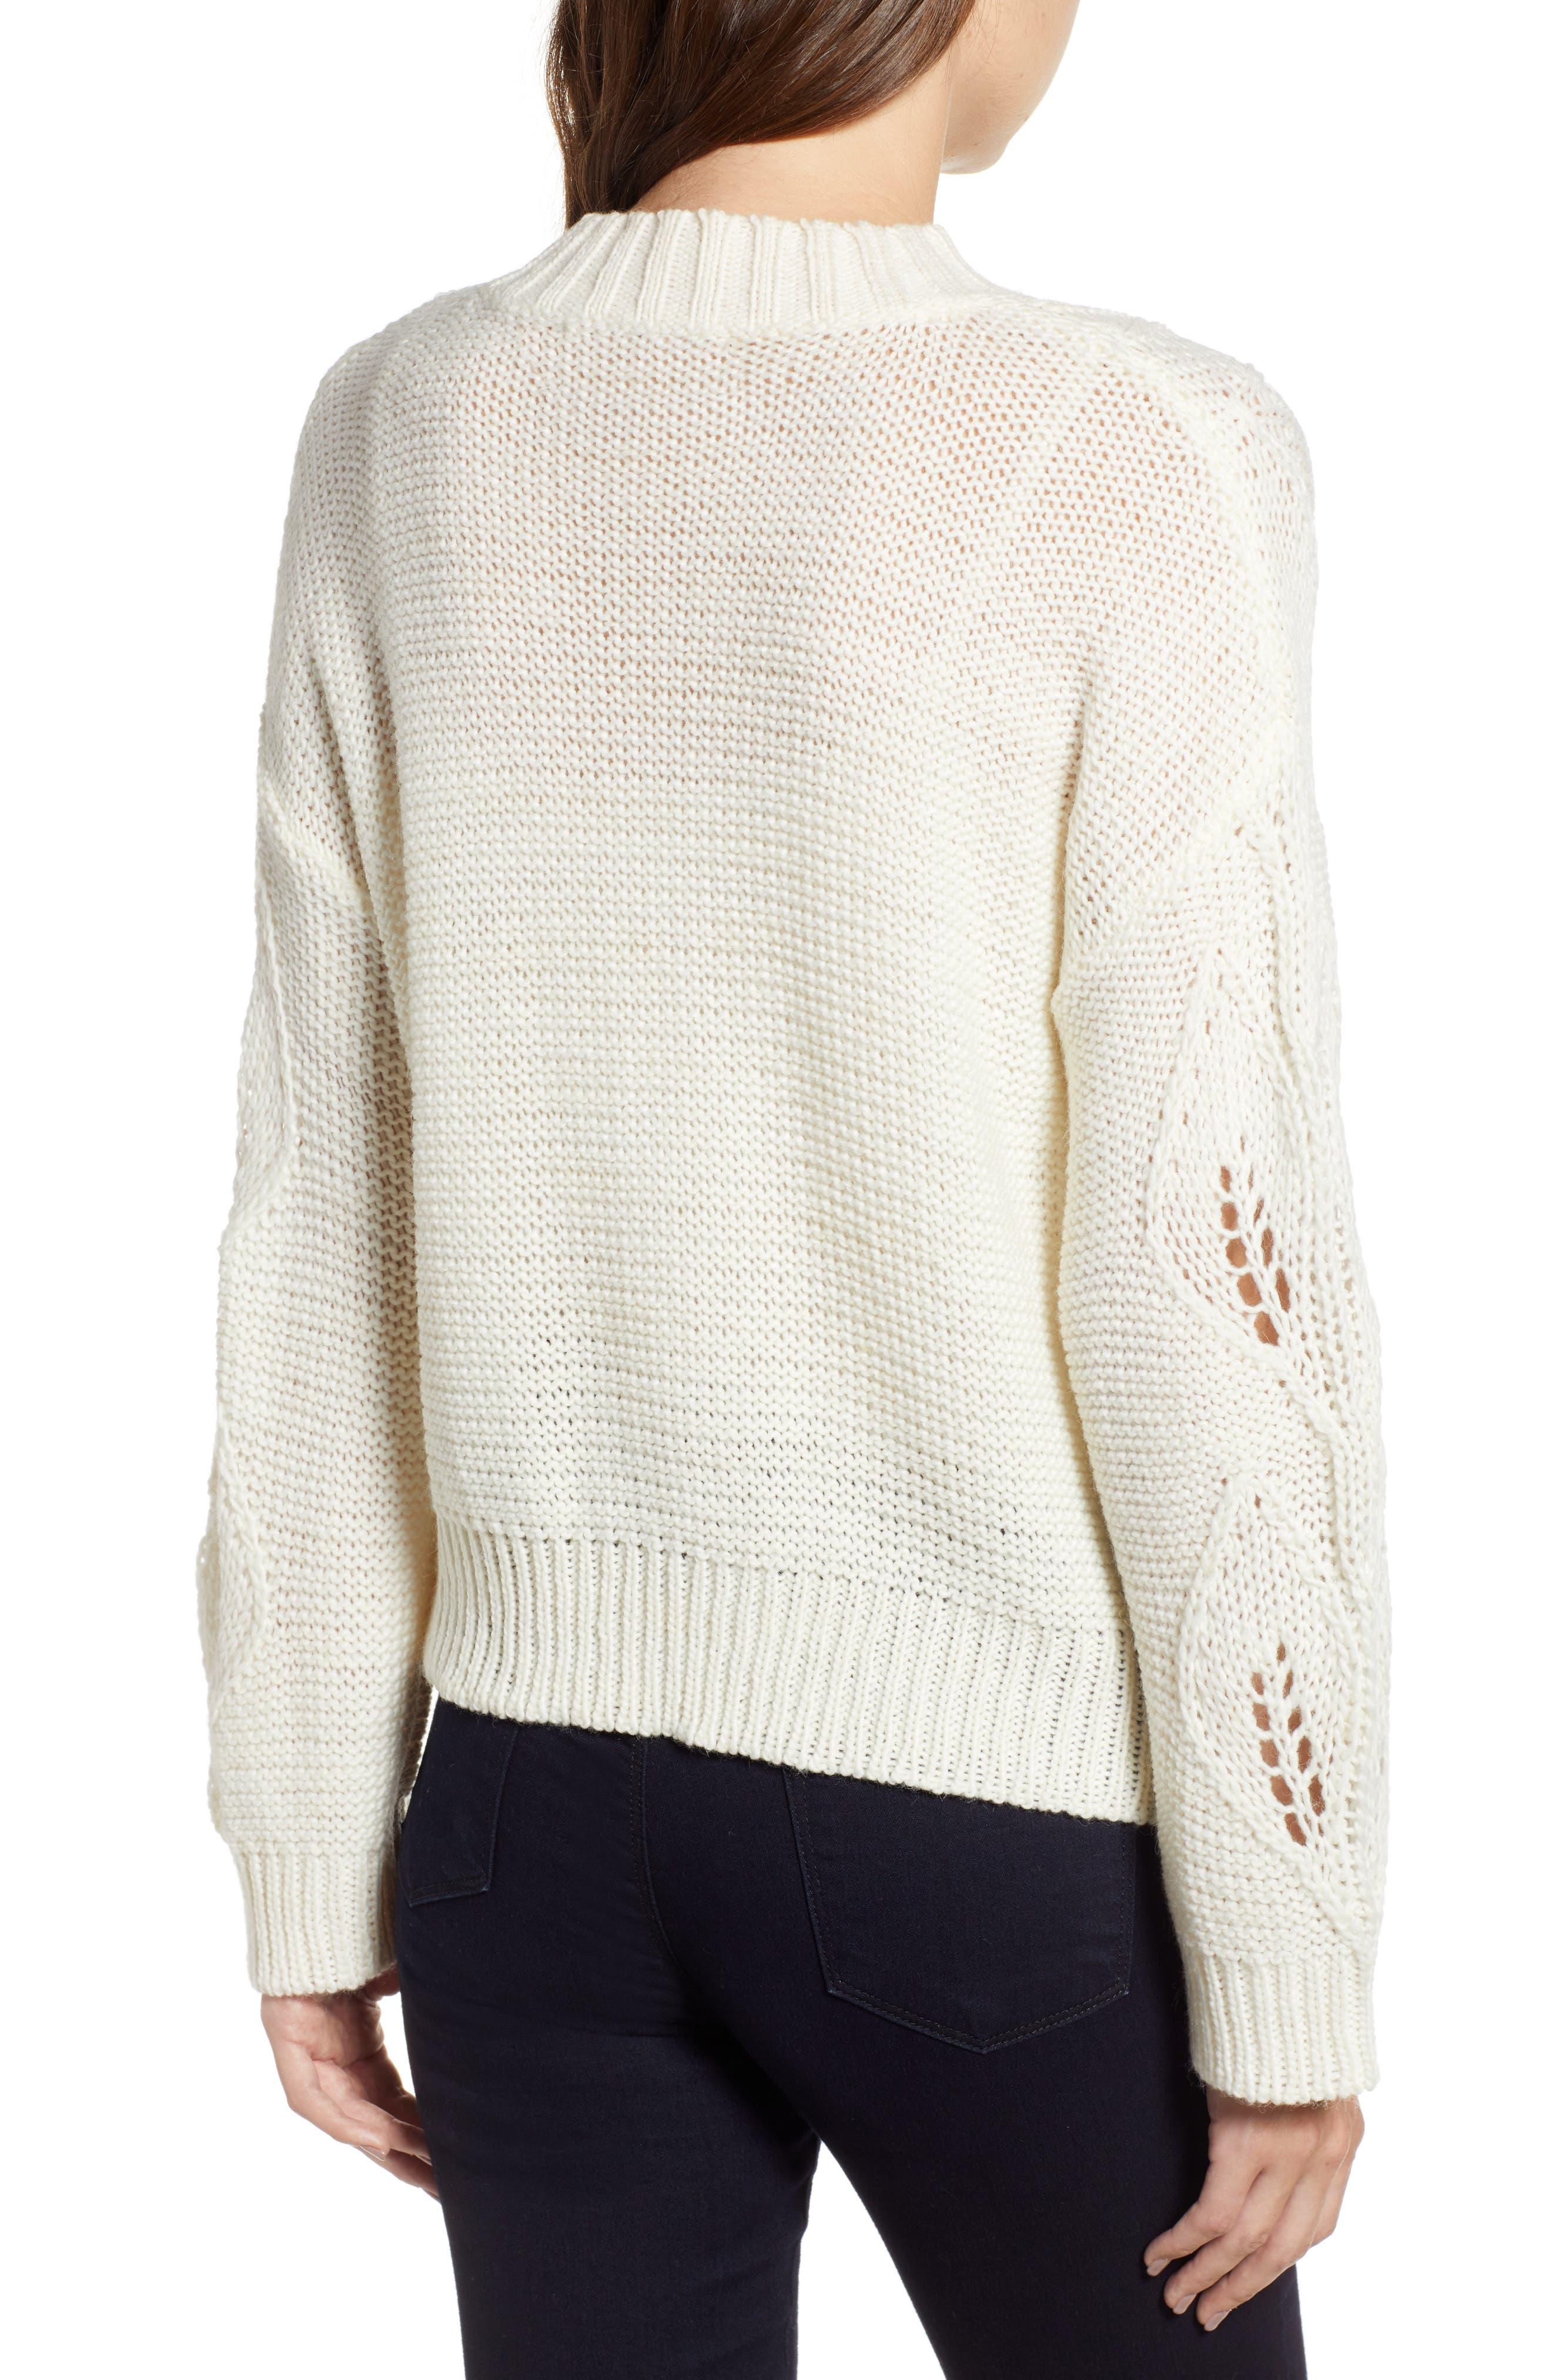 Bishop + Young Botanical Sweater,                             Alternate thumbnail 2, color,                             CREAM